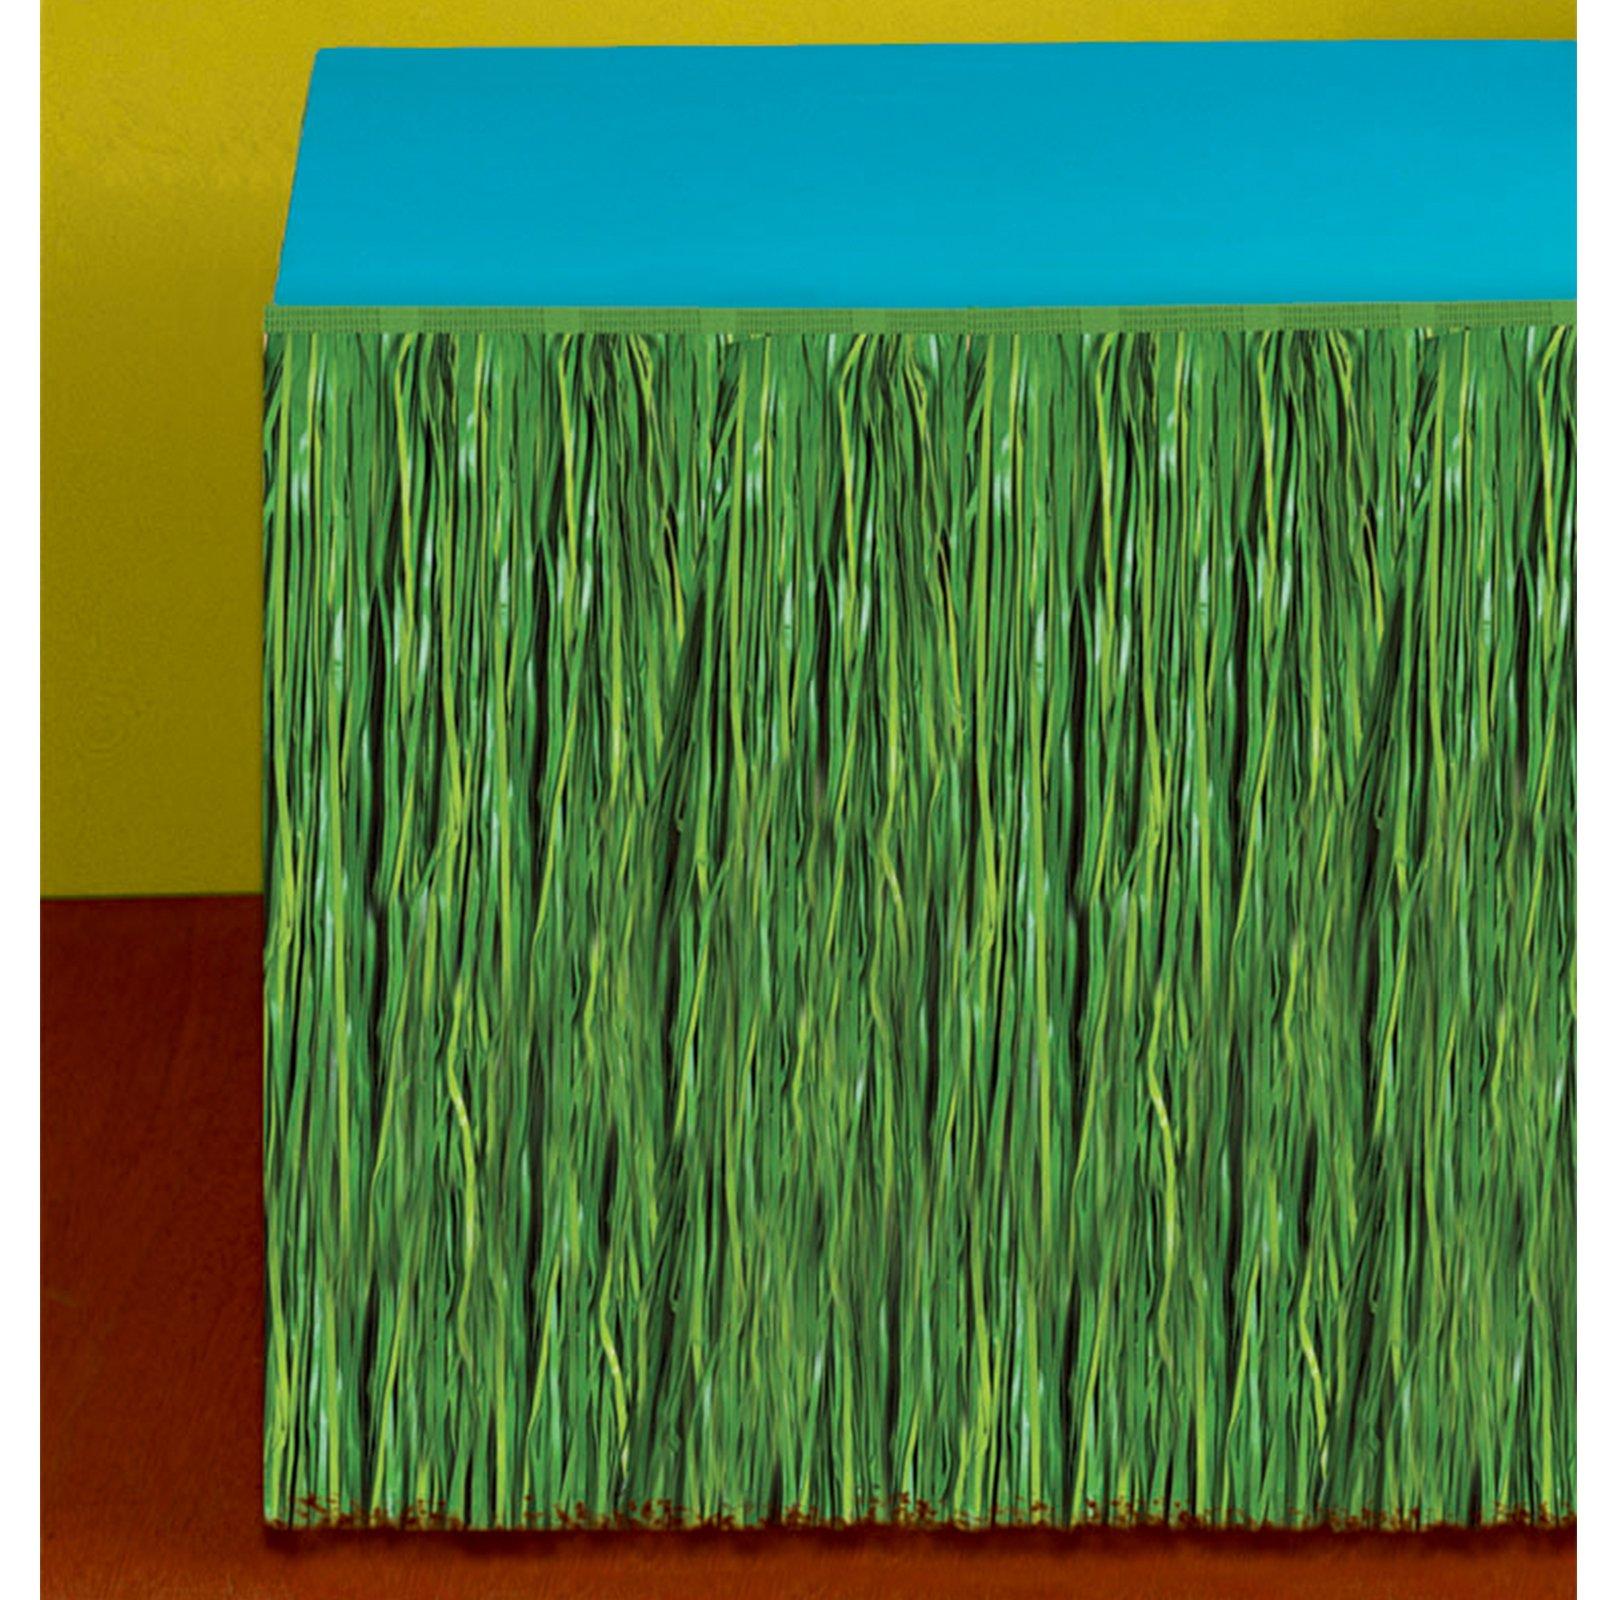 Amscan Hawaiian Luau Party Grass Table Skirt Tropical Summer Beach Picnic Table Decoration, Plastic, Green, 9' x 29''